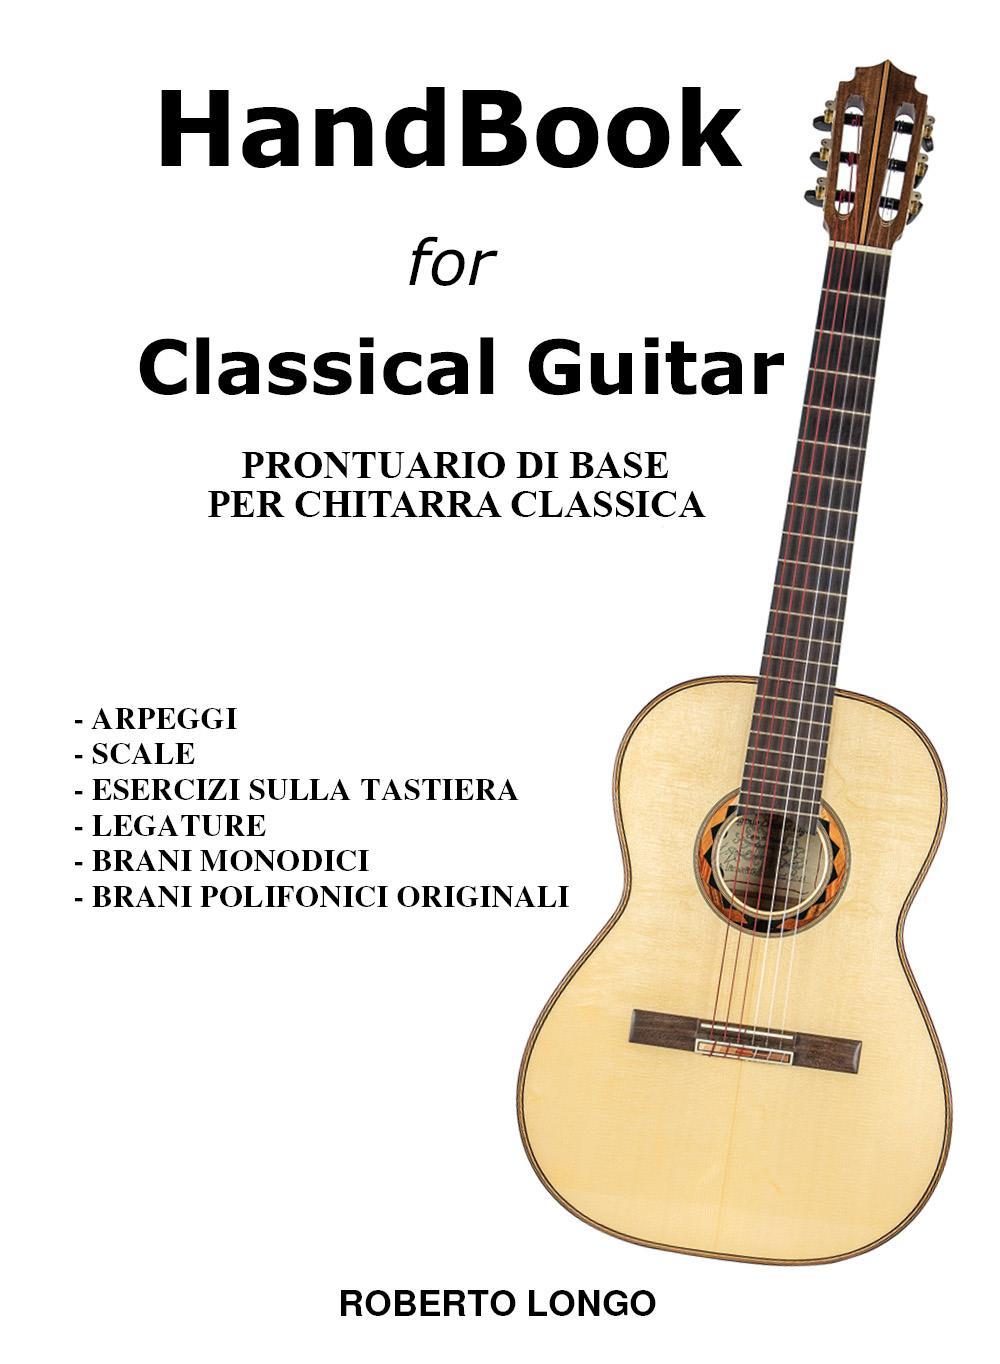 HANDBOOK for Classical Guitar